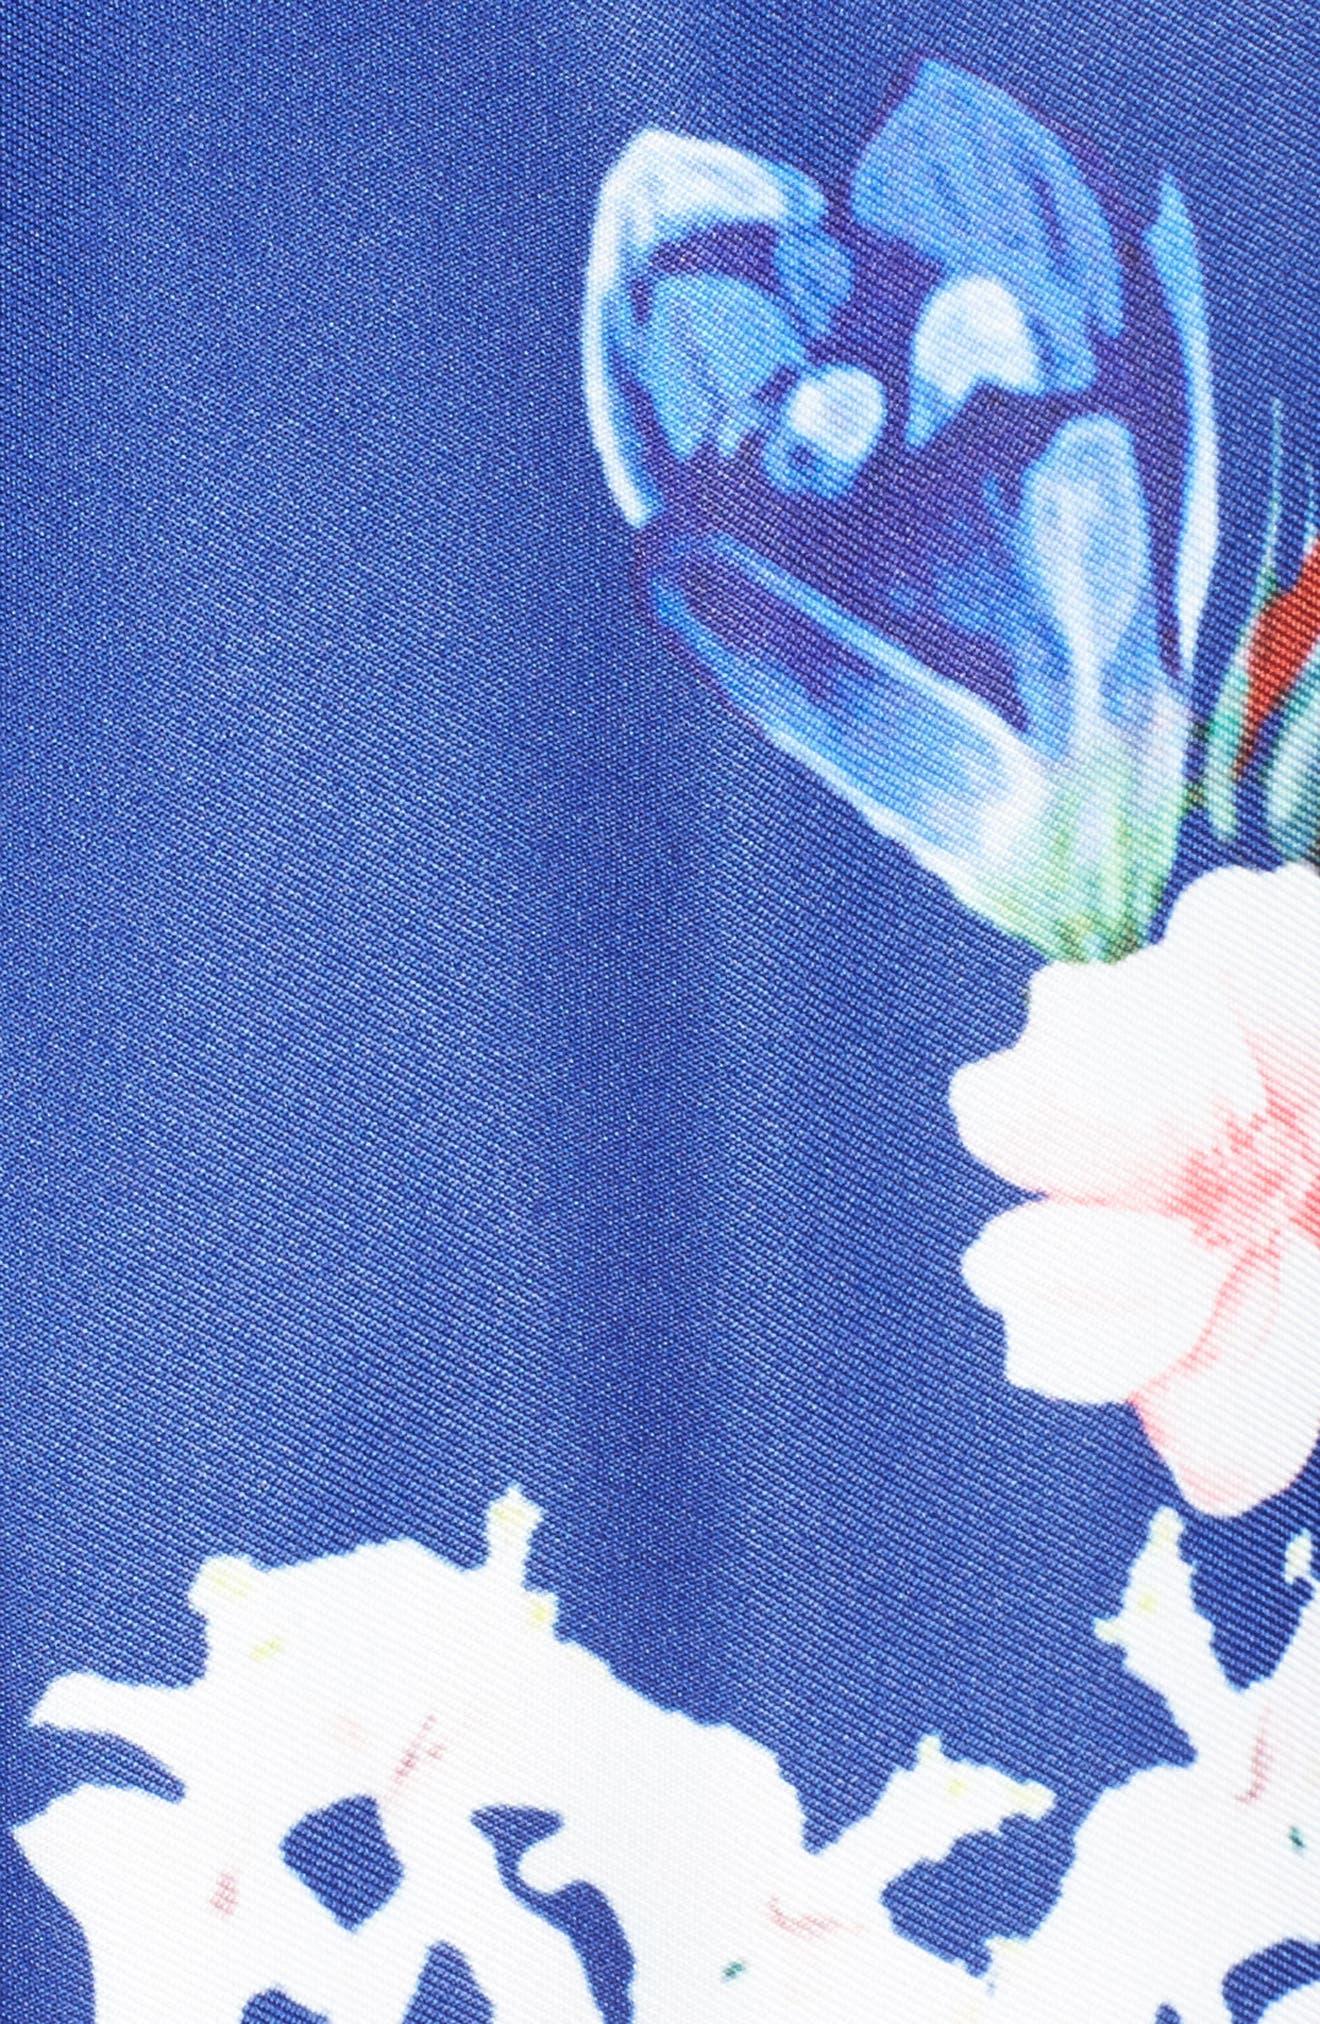 Floral Strapless Cocktail Dress,                             Alternate thumbnail 5, color,                             FLORAL